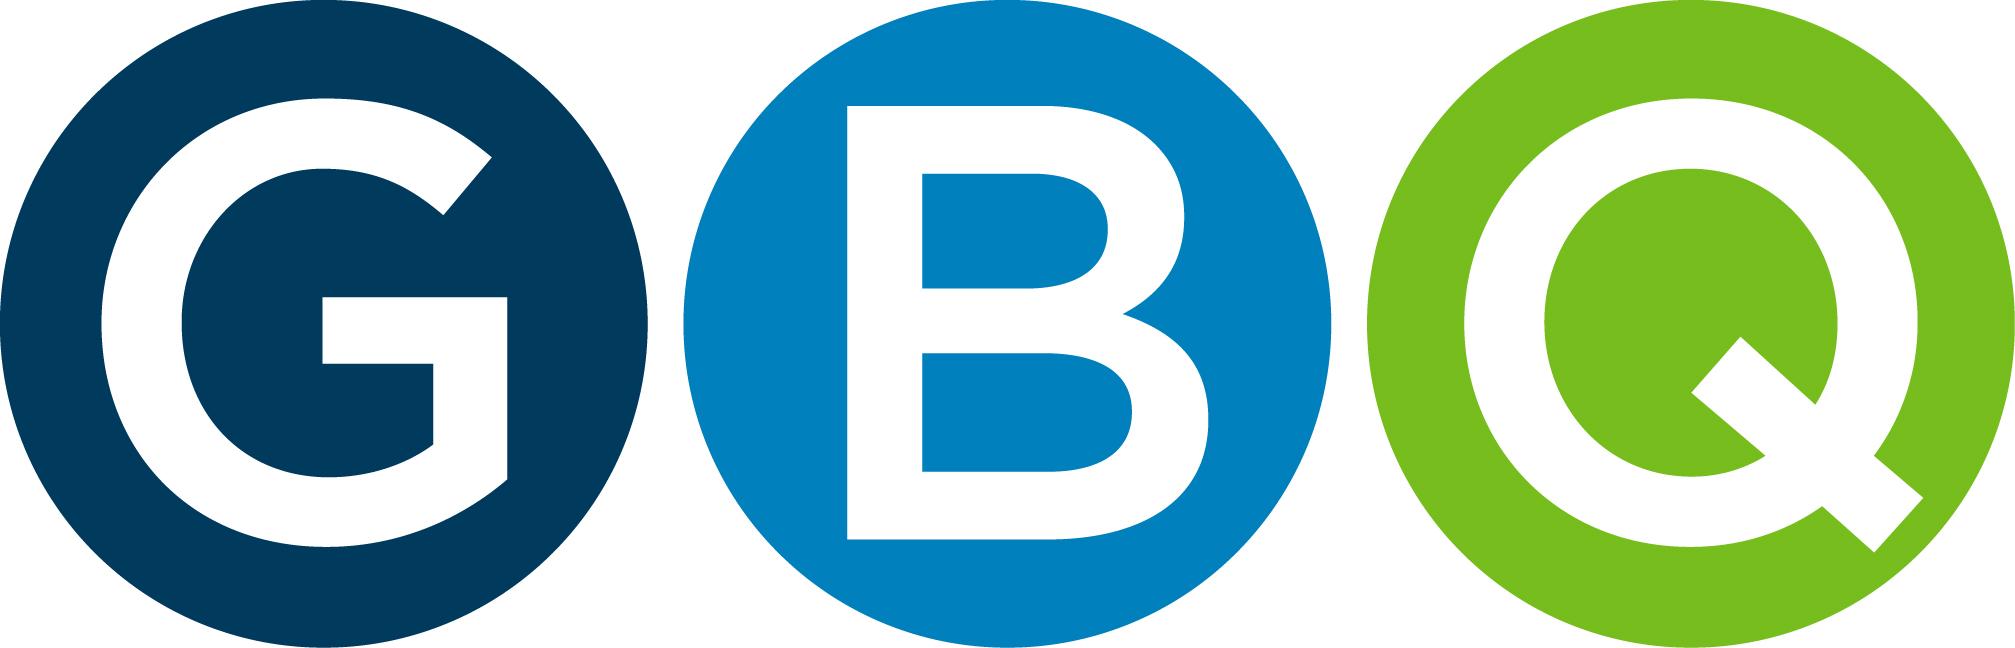 GBQ Partners LLC logo